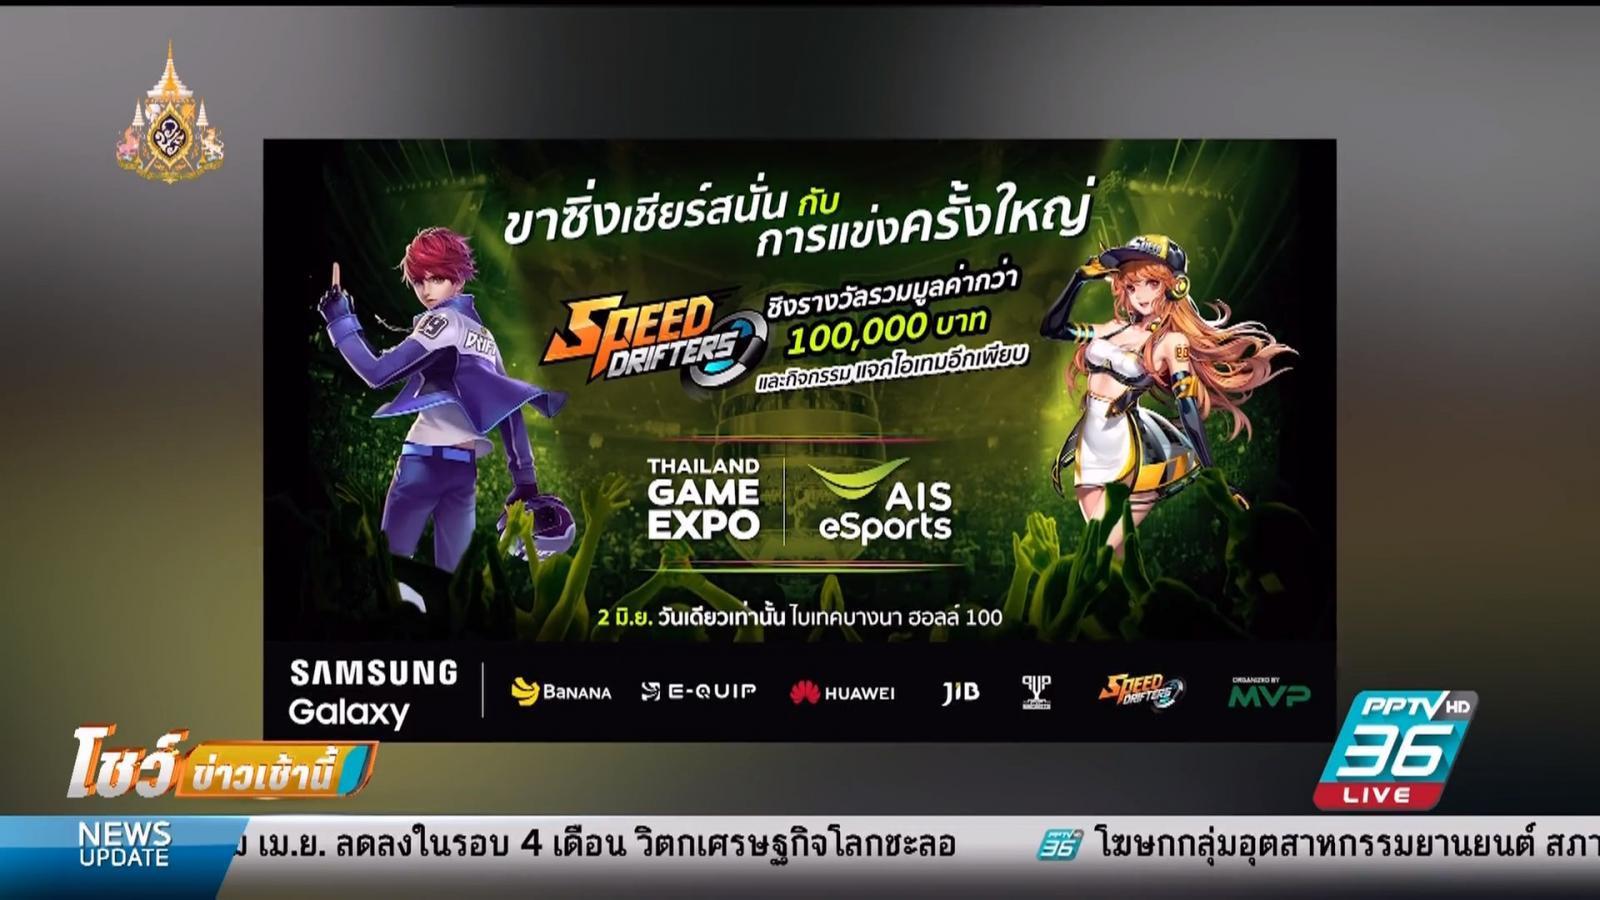 "AIS ผนึก M Vision พร้อมอภิมหาพาร์ทเนอร์ขั้นเทพจัดงาน ""Thailand Game Expo by AIS eSports"""